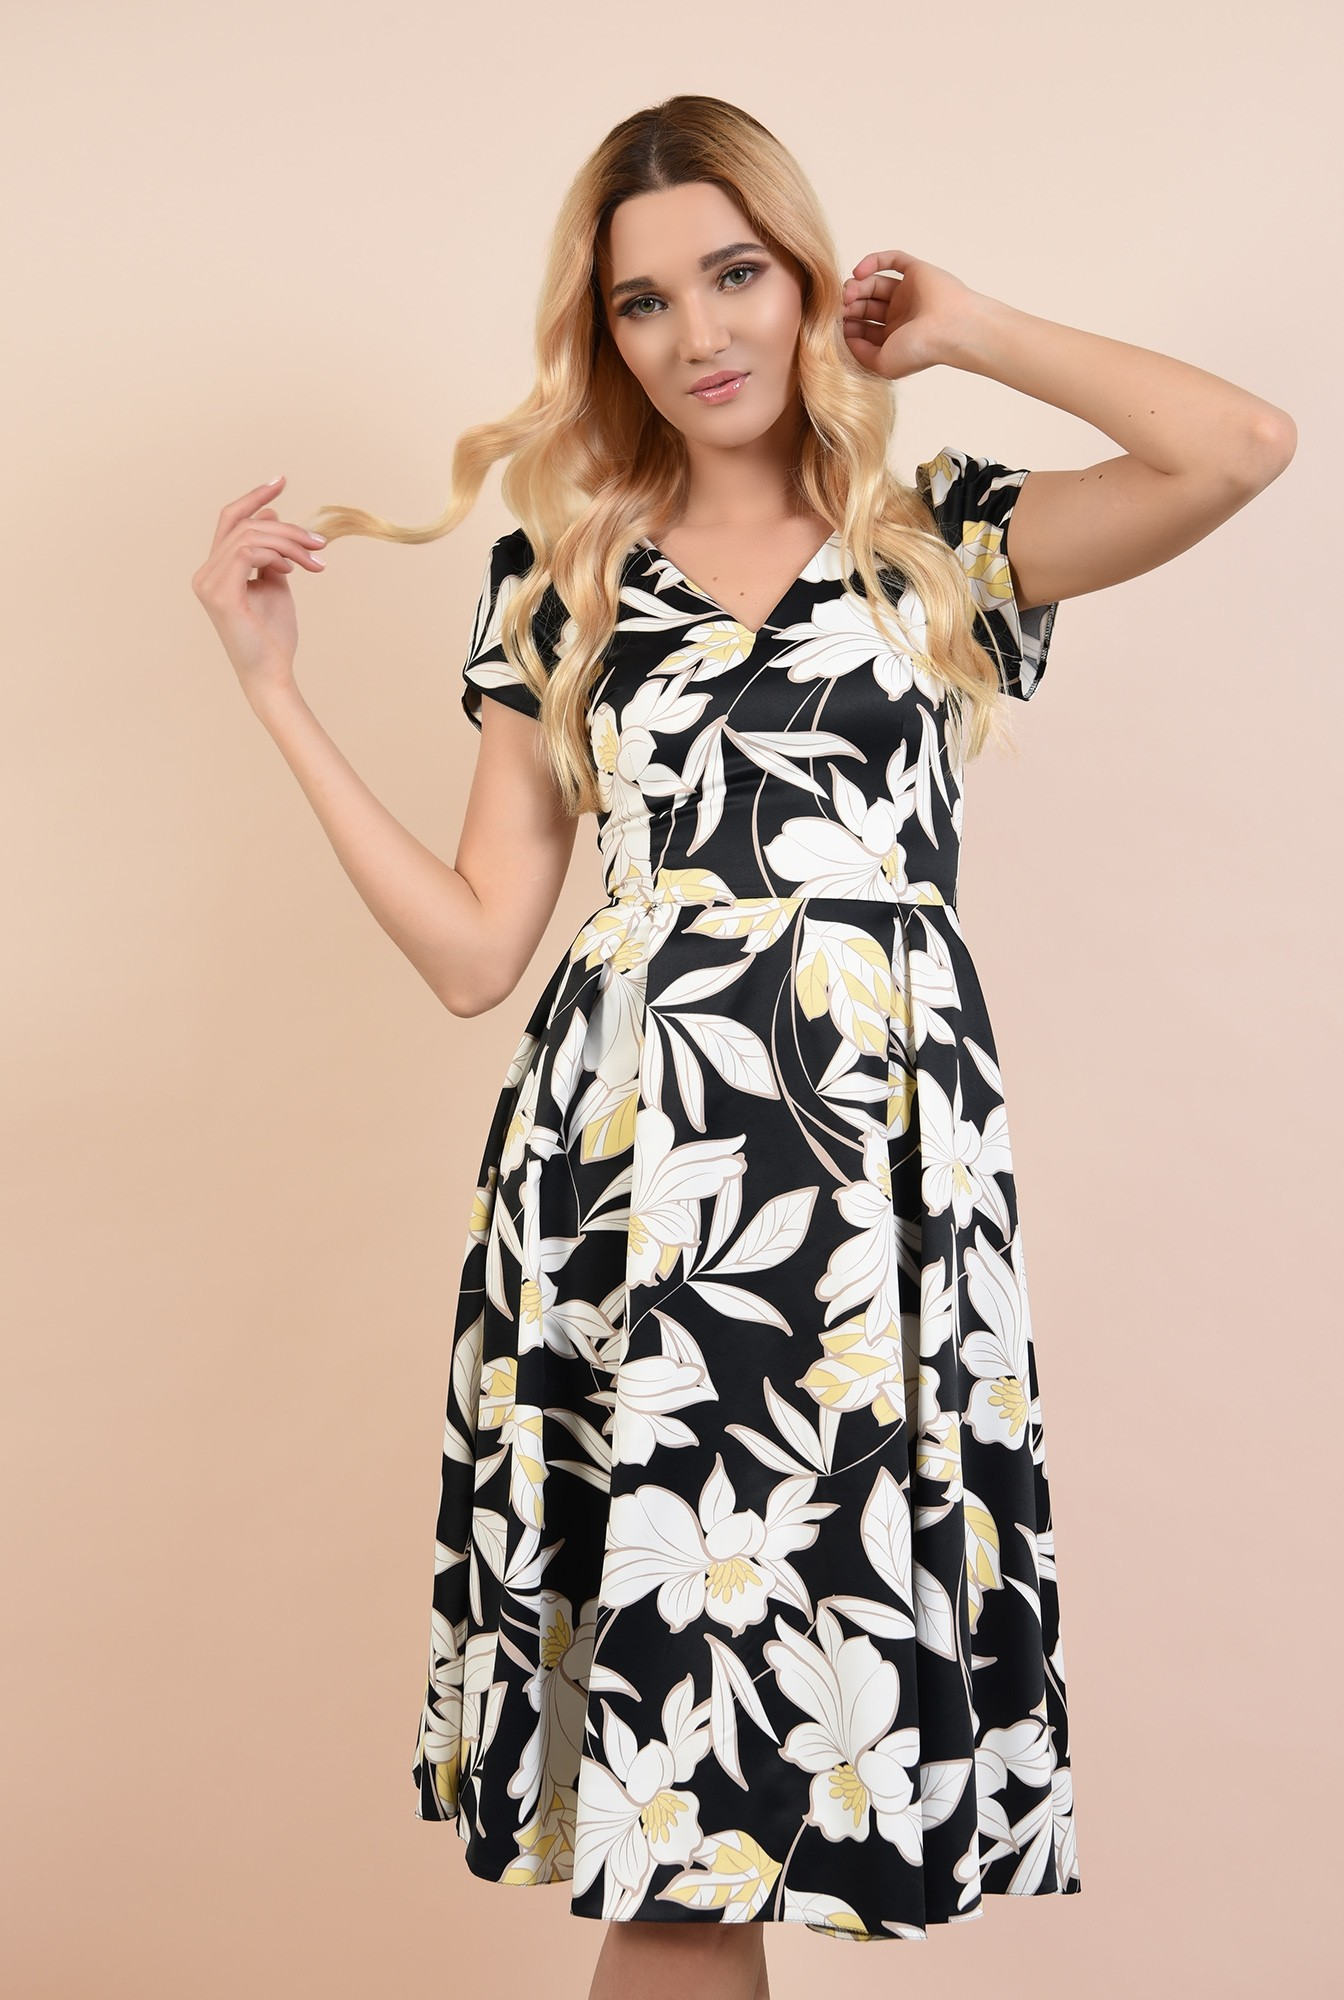 0 - rochie de ocazie, cu motive florale, anchior, maneci bufante lalea